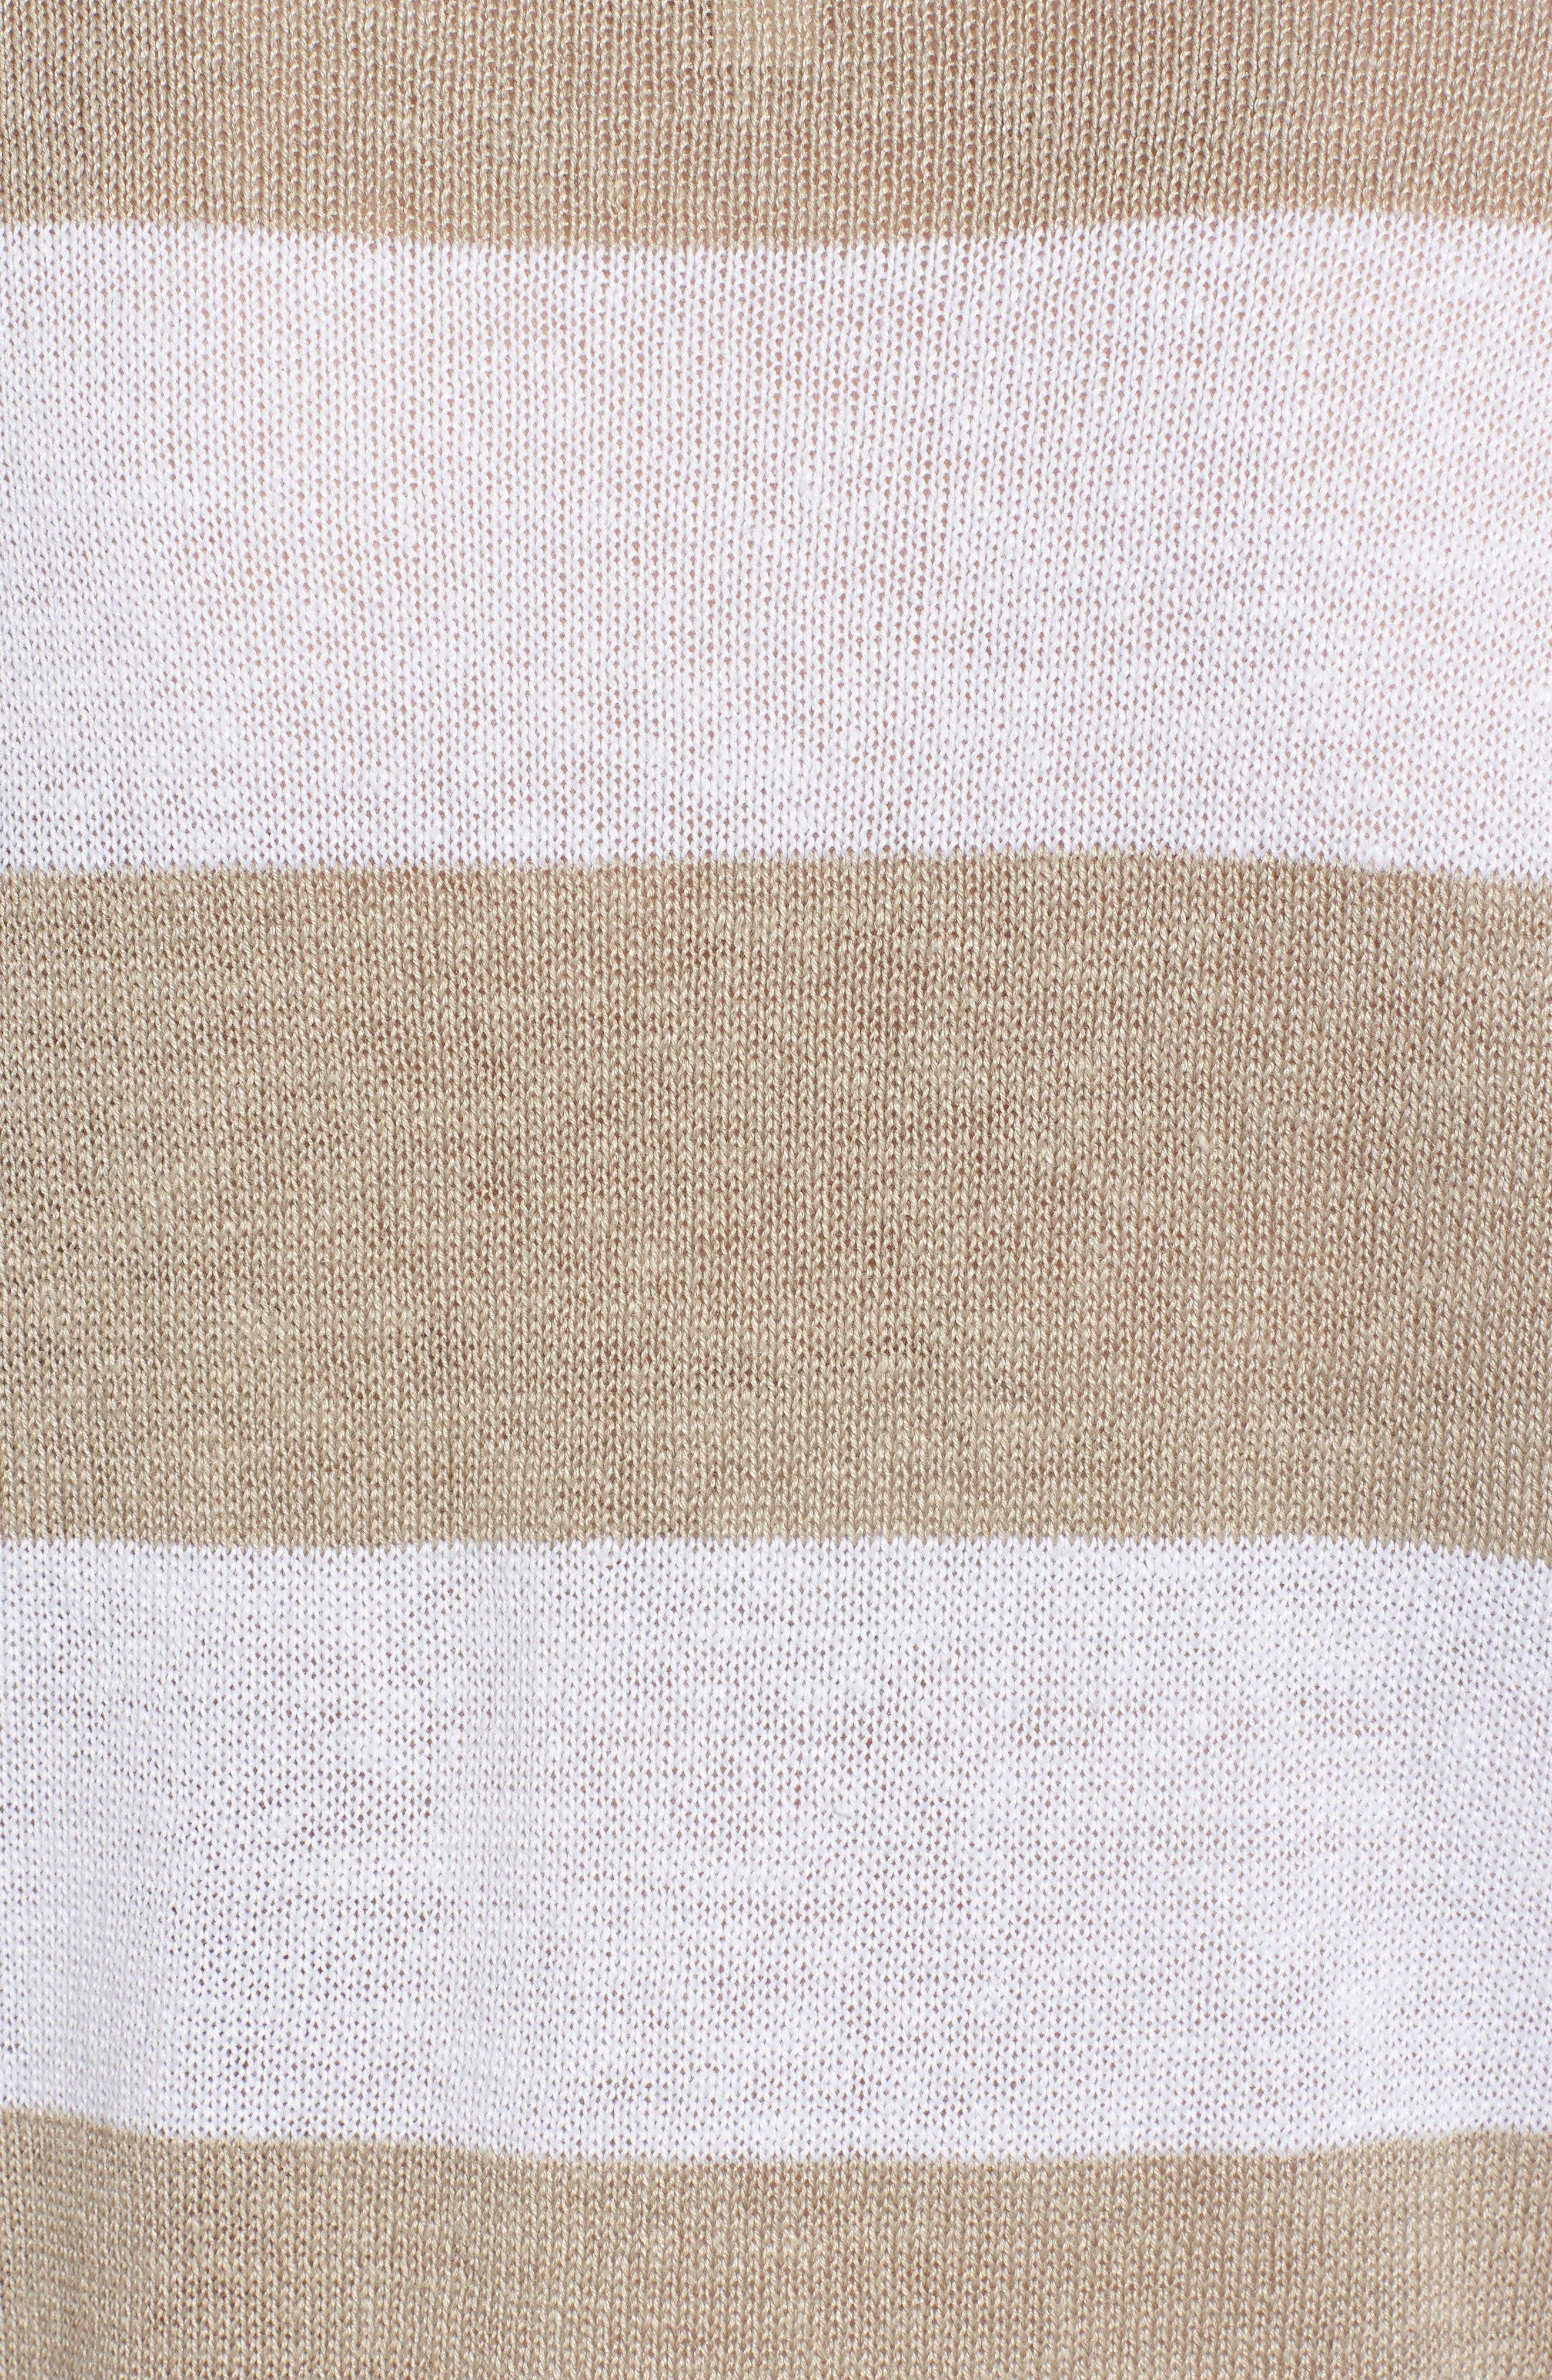 Stripe Organic Linen Knit A-Line Top,                             Alternate thumbnail 5, color,                             White/ Natural